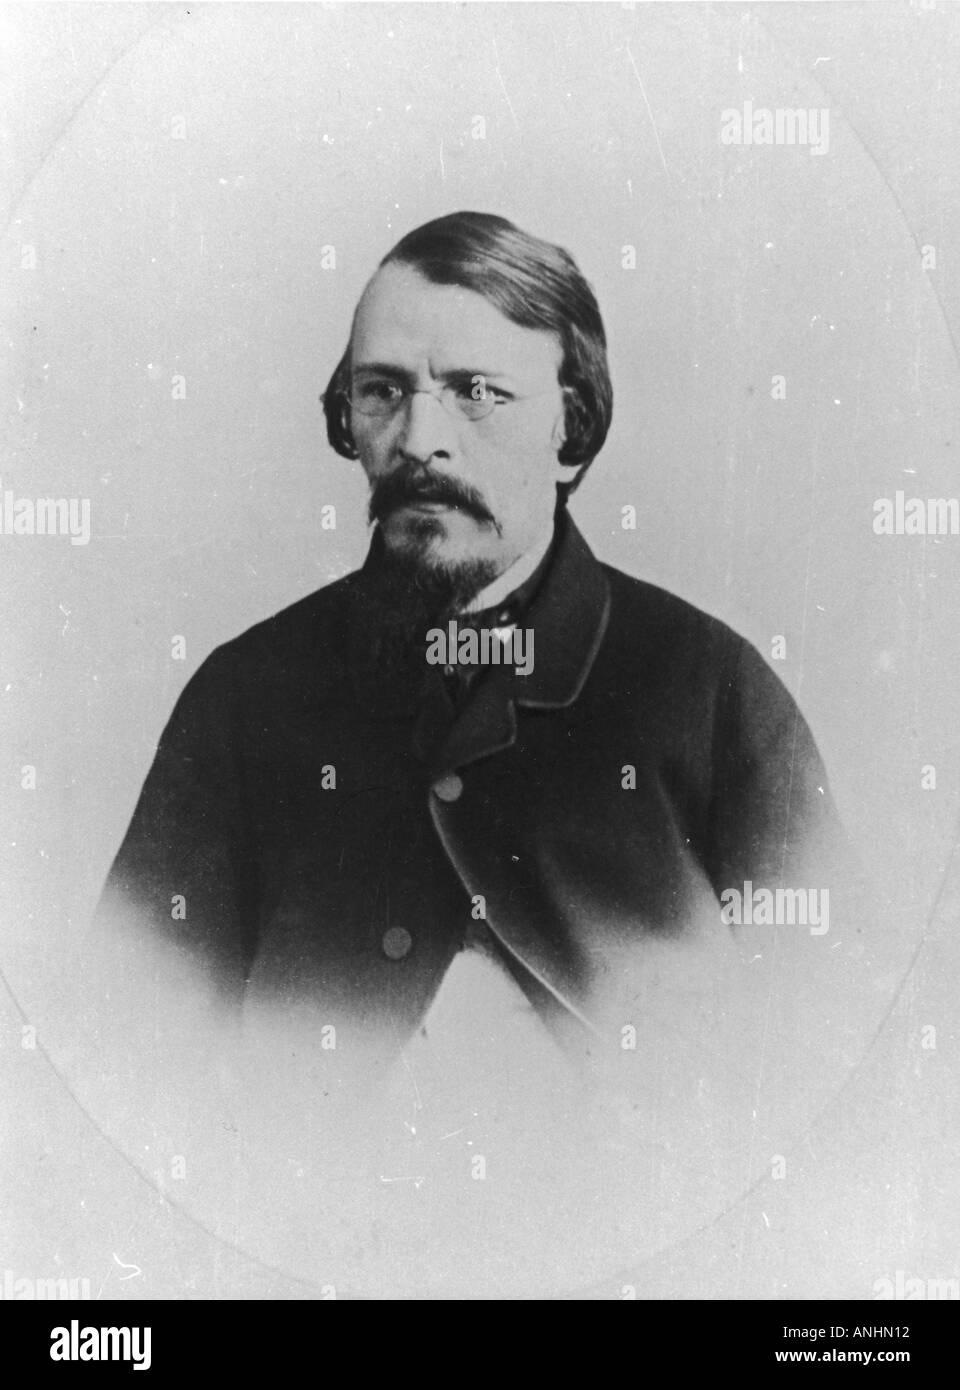 Dostoievsky 1821 1881 - Stock Image